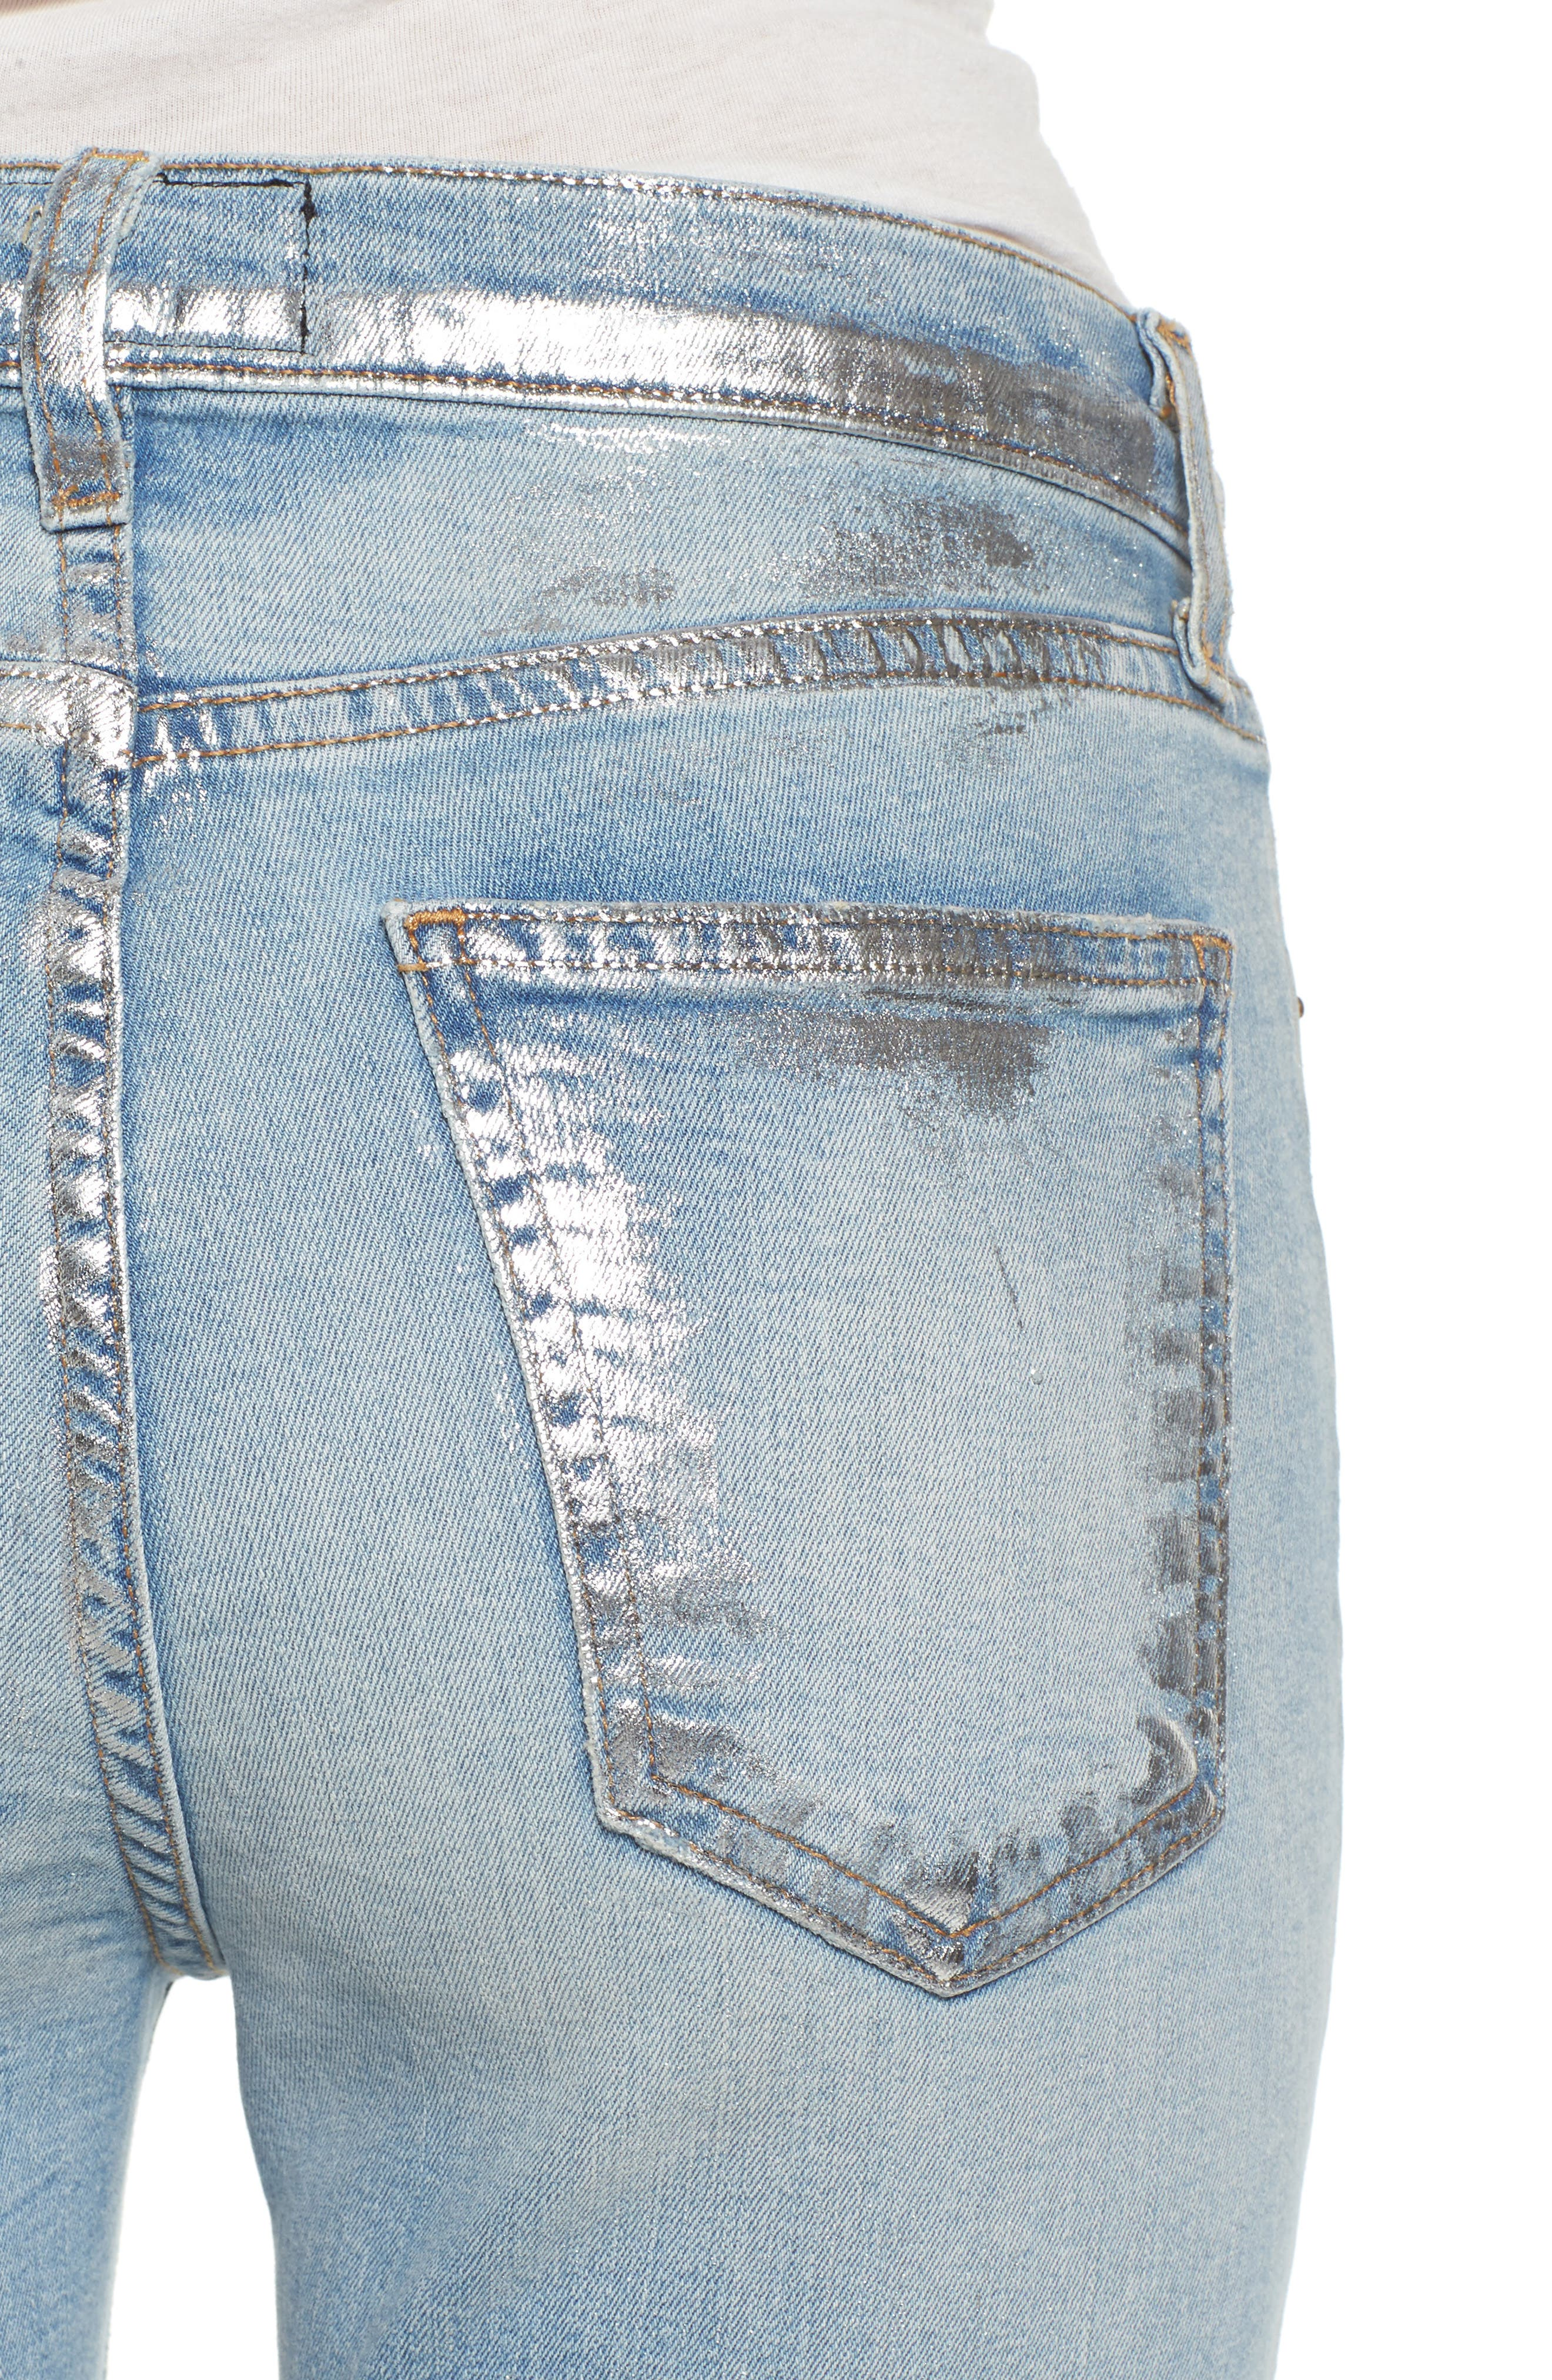 The Stiletto High Waist Skinny Jeans,                             Alternate thumbnail 4, color,                             Seville Destroy/ Foil